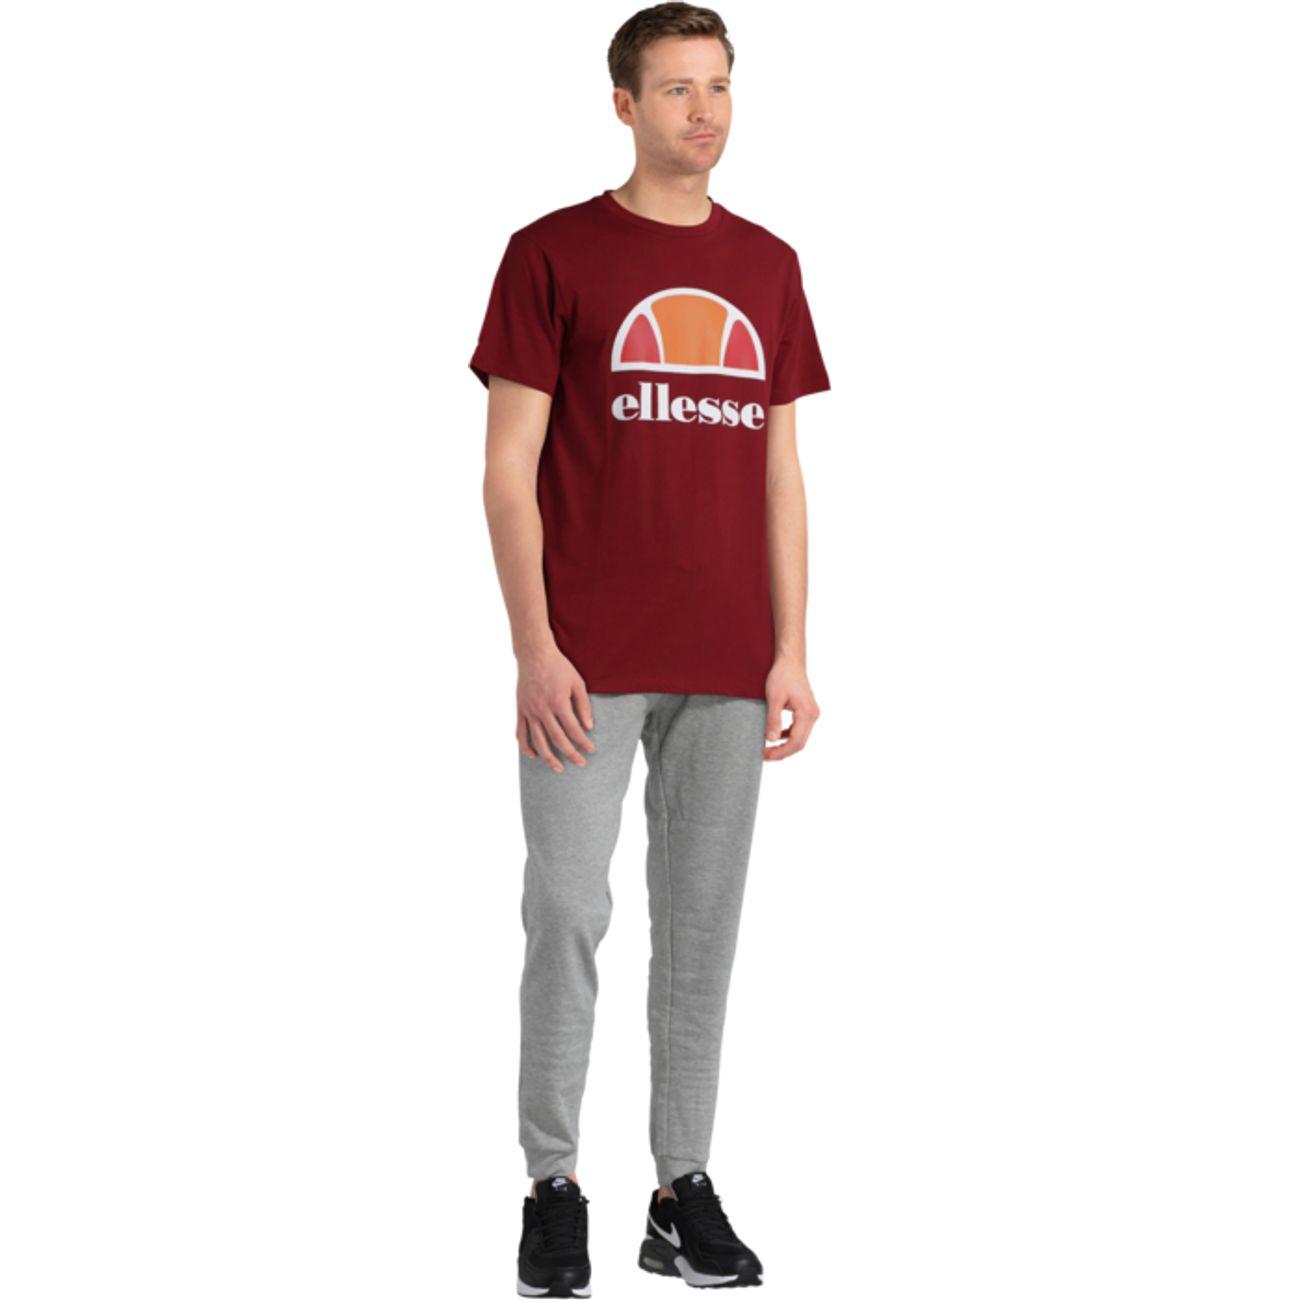 Tee Shirt MC Multisport homme ELLESSE ECRILLO